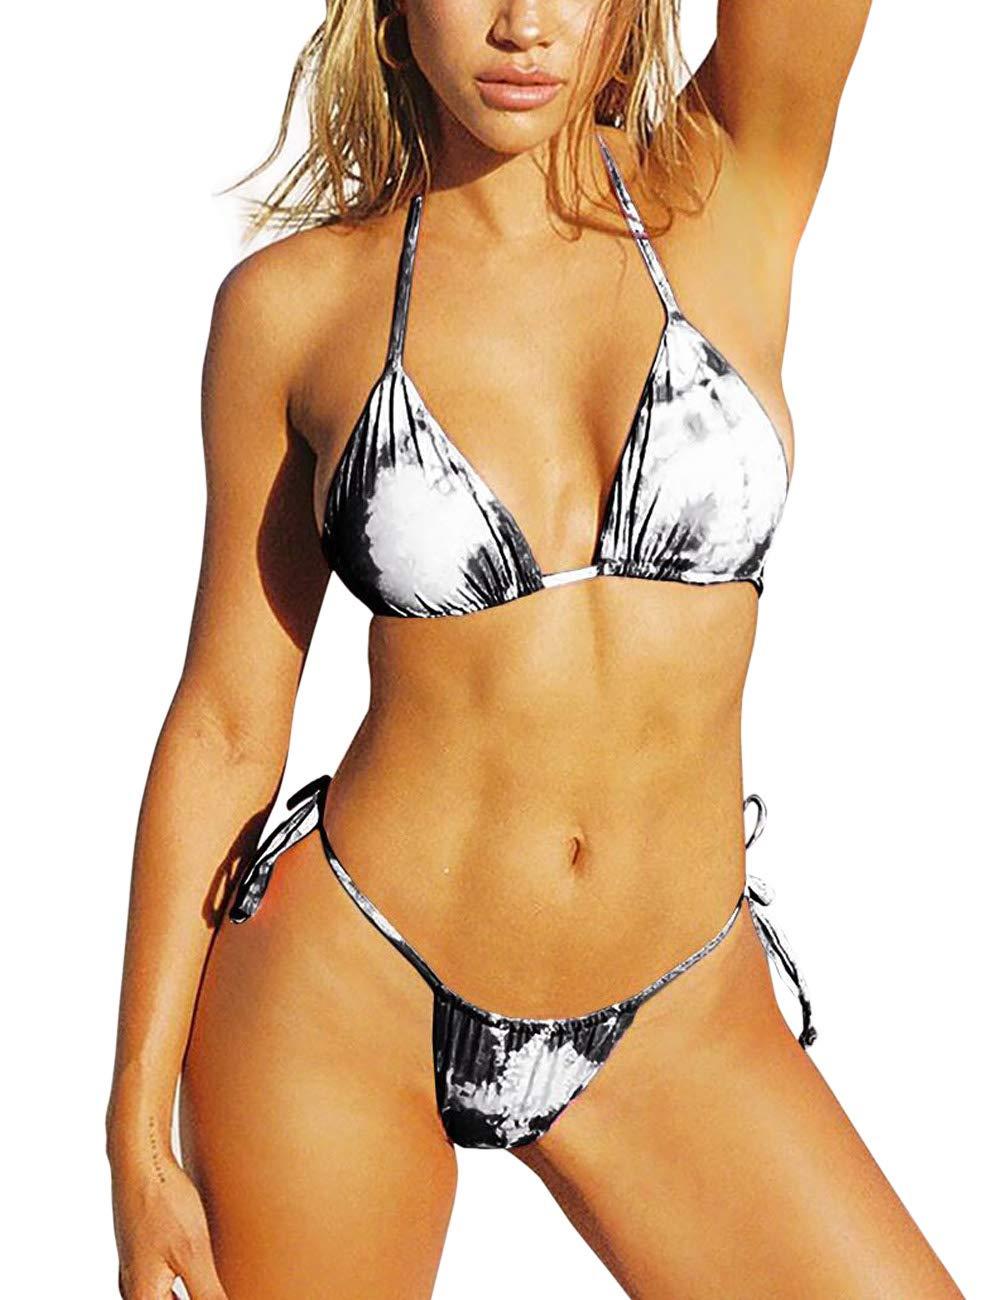 KUANGDUO Womens High Cut Swimsuits Printing Bikini Sets Two Pieces Swimwear Tie Knoted Bathing Suit